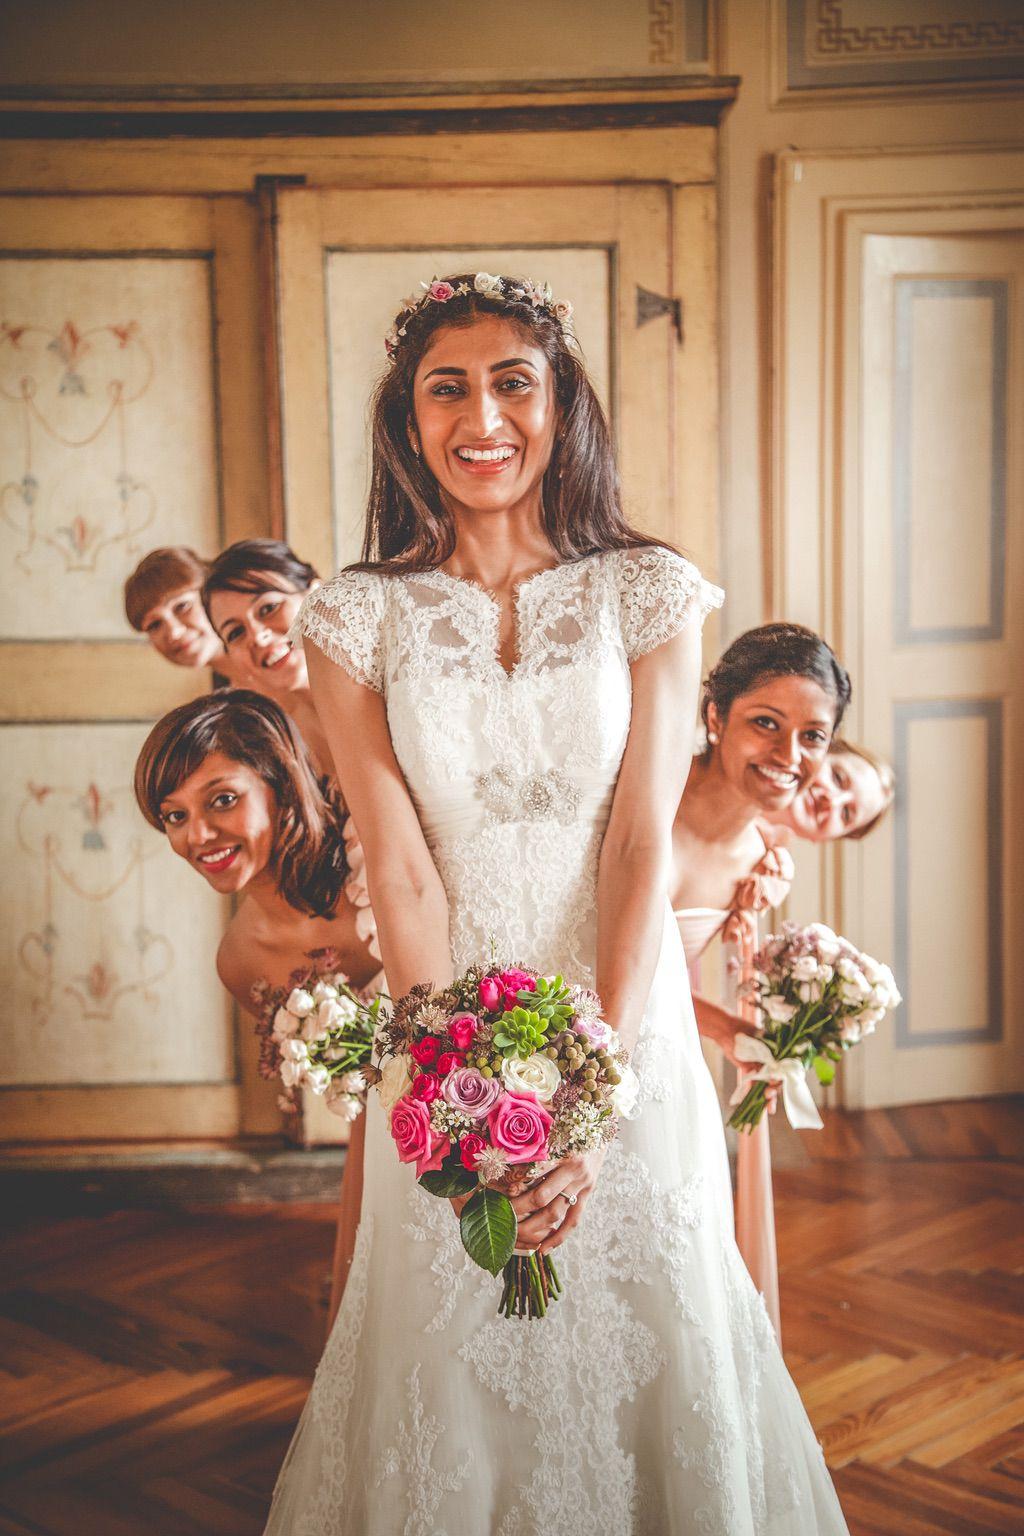 bride-bridesmaids-fusion-Pakistani-wedding-villa-catignano-Tuscany